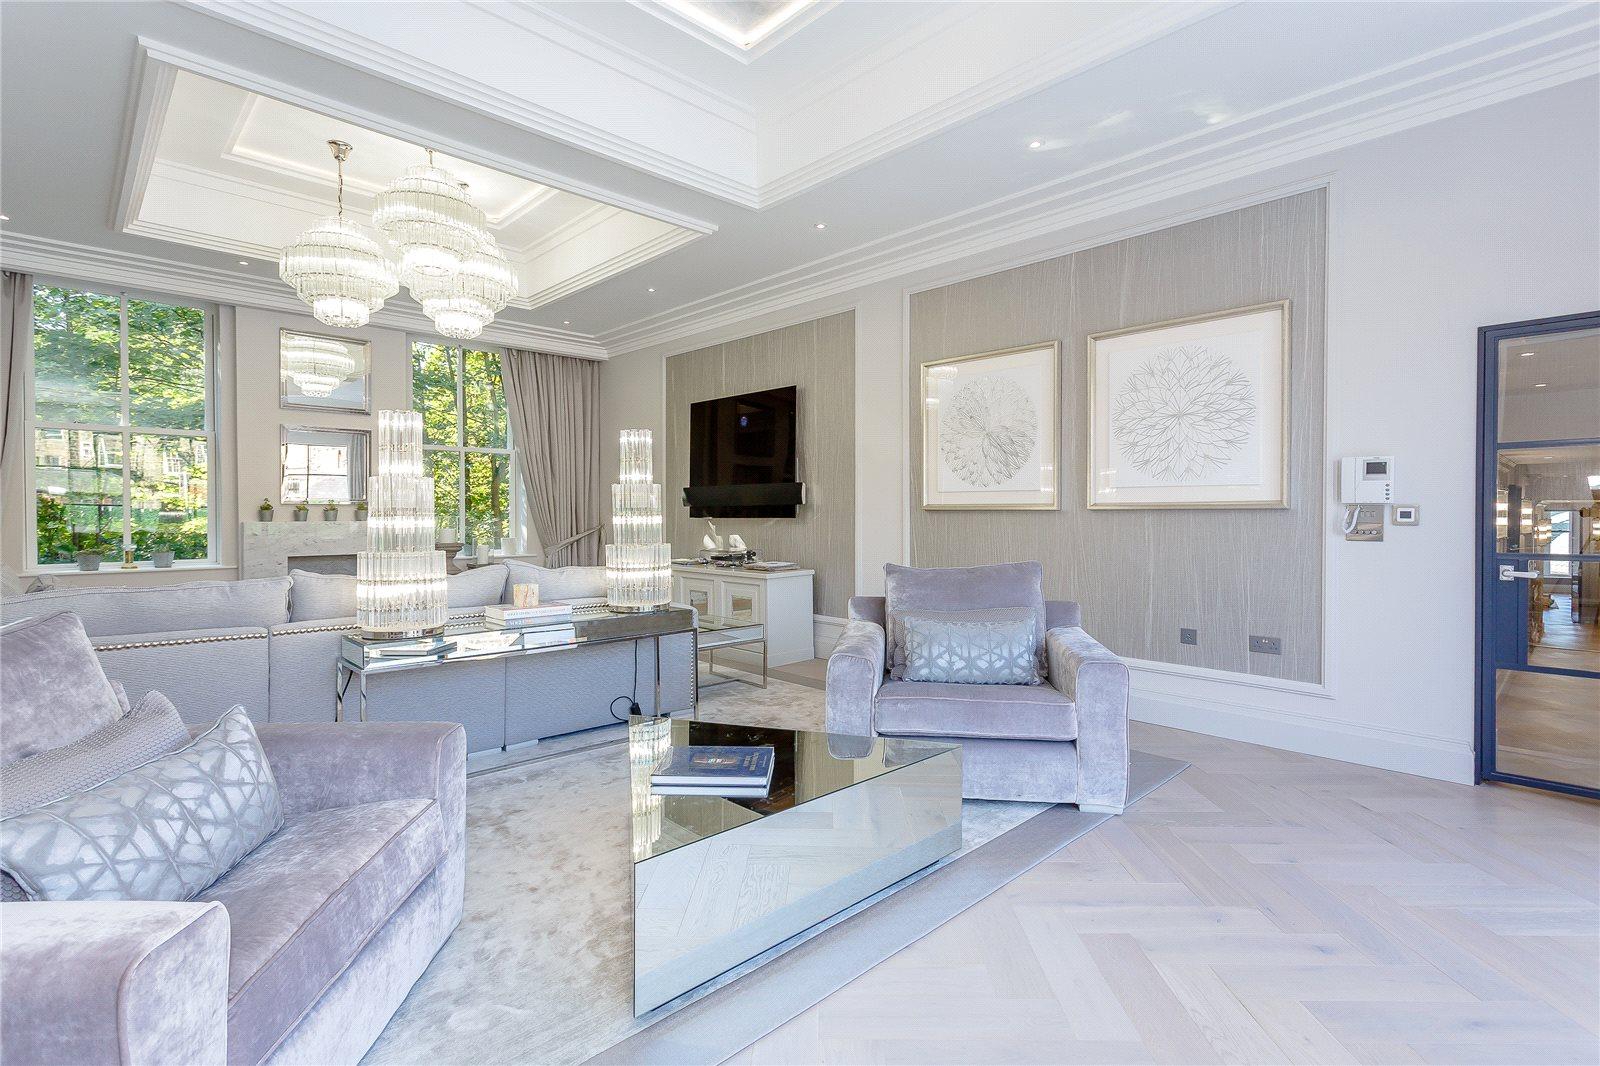 Imperial mansions harrogate, living room